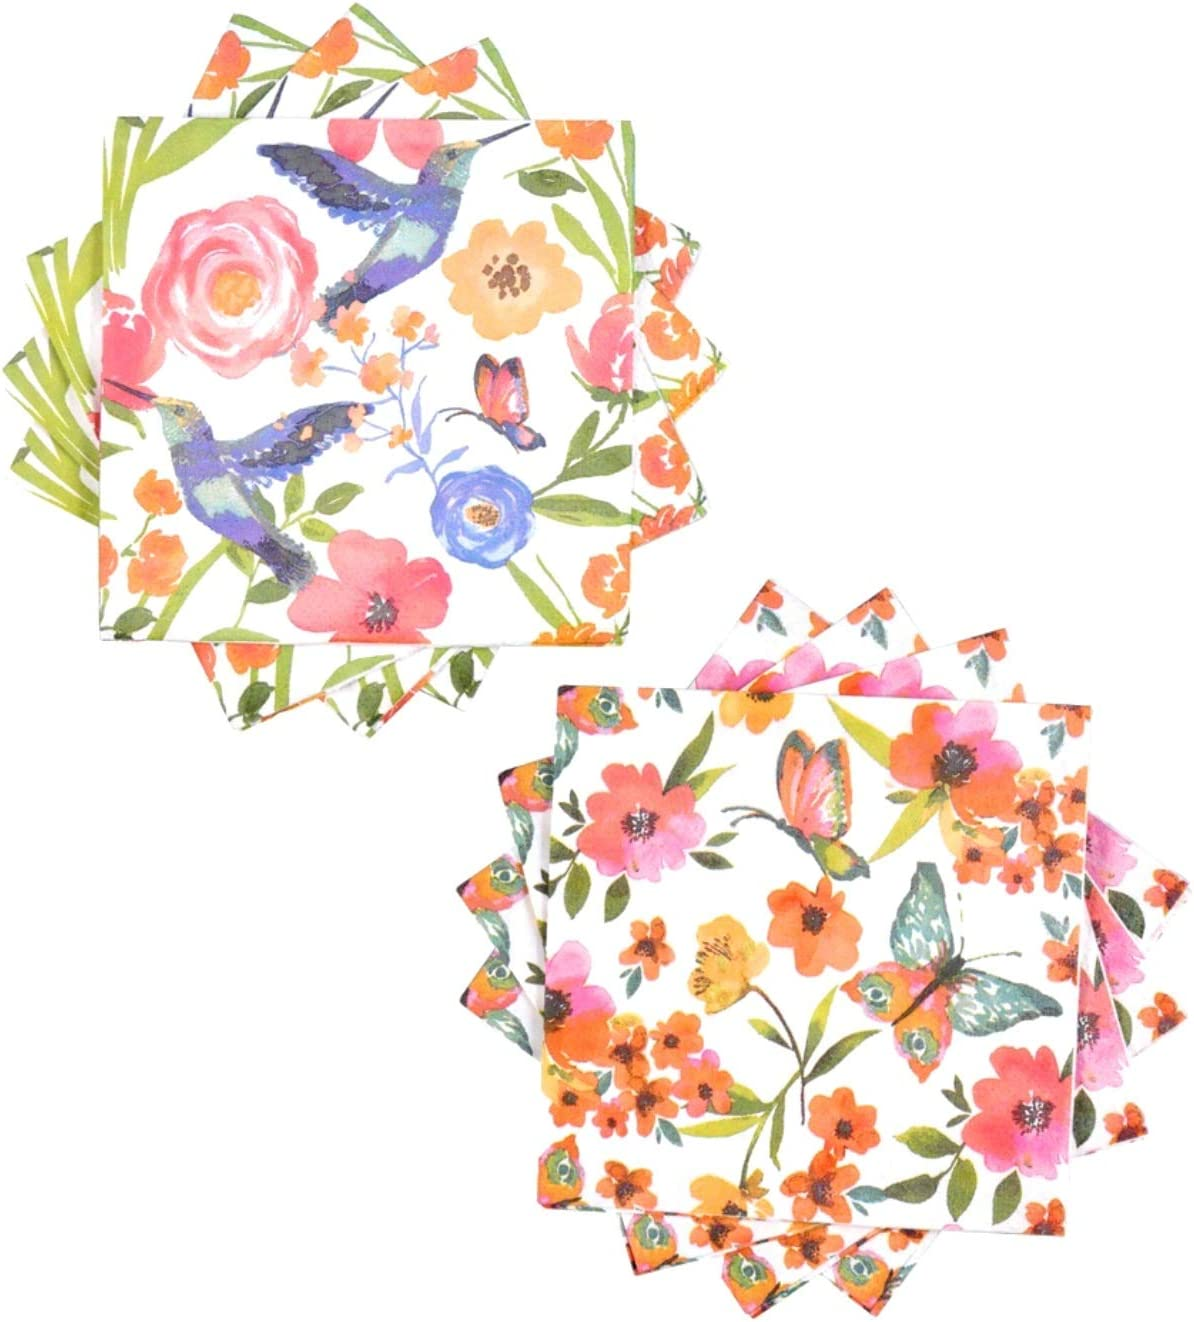 Spring Fling Butterflies & Hummingbirds Paper Beverage Napkins, 2 Designs (28-ct ea)